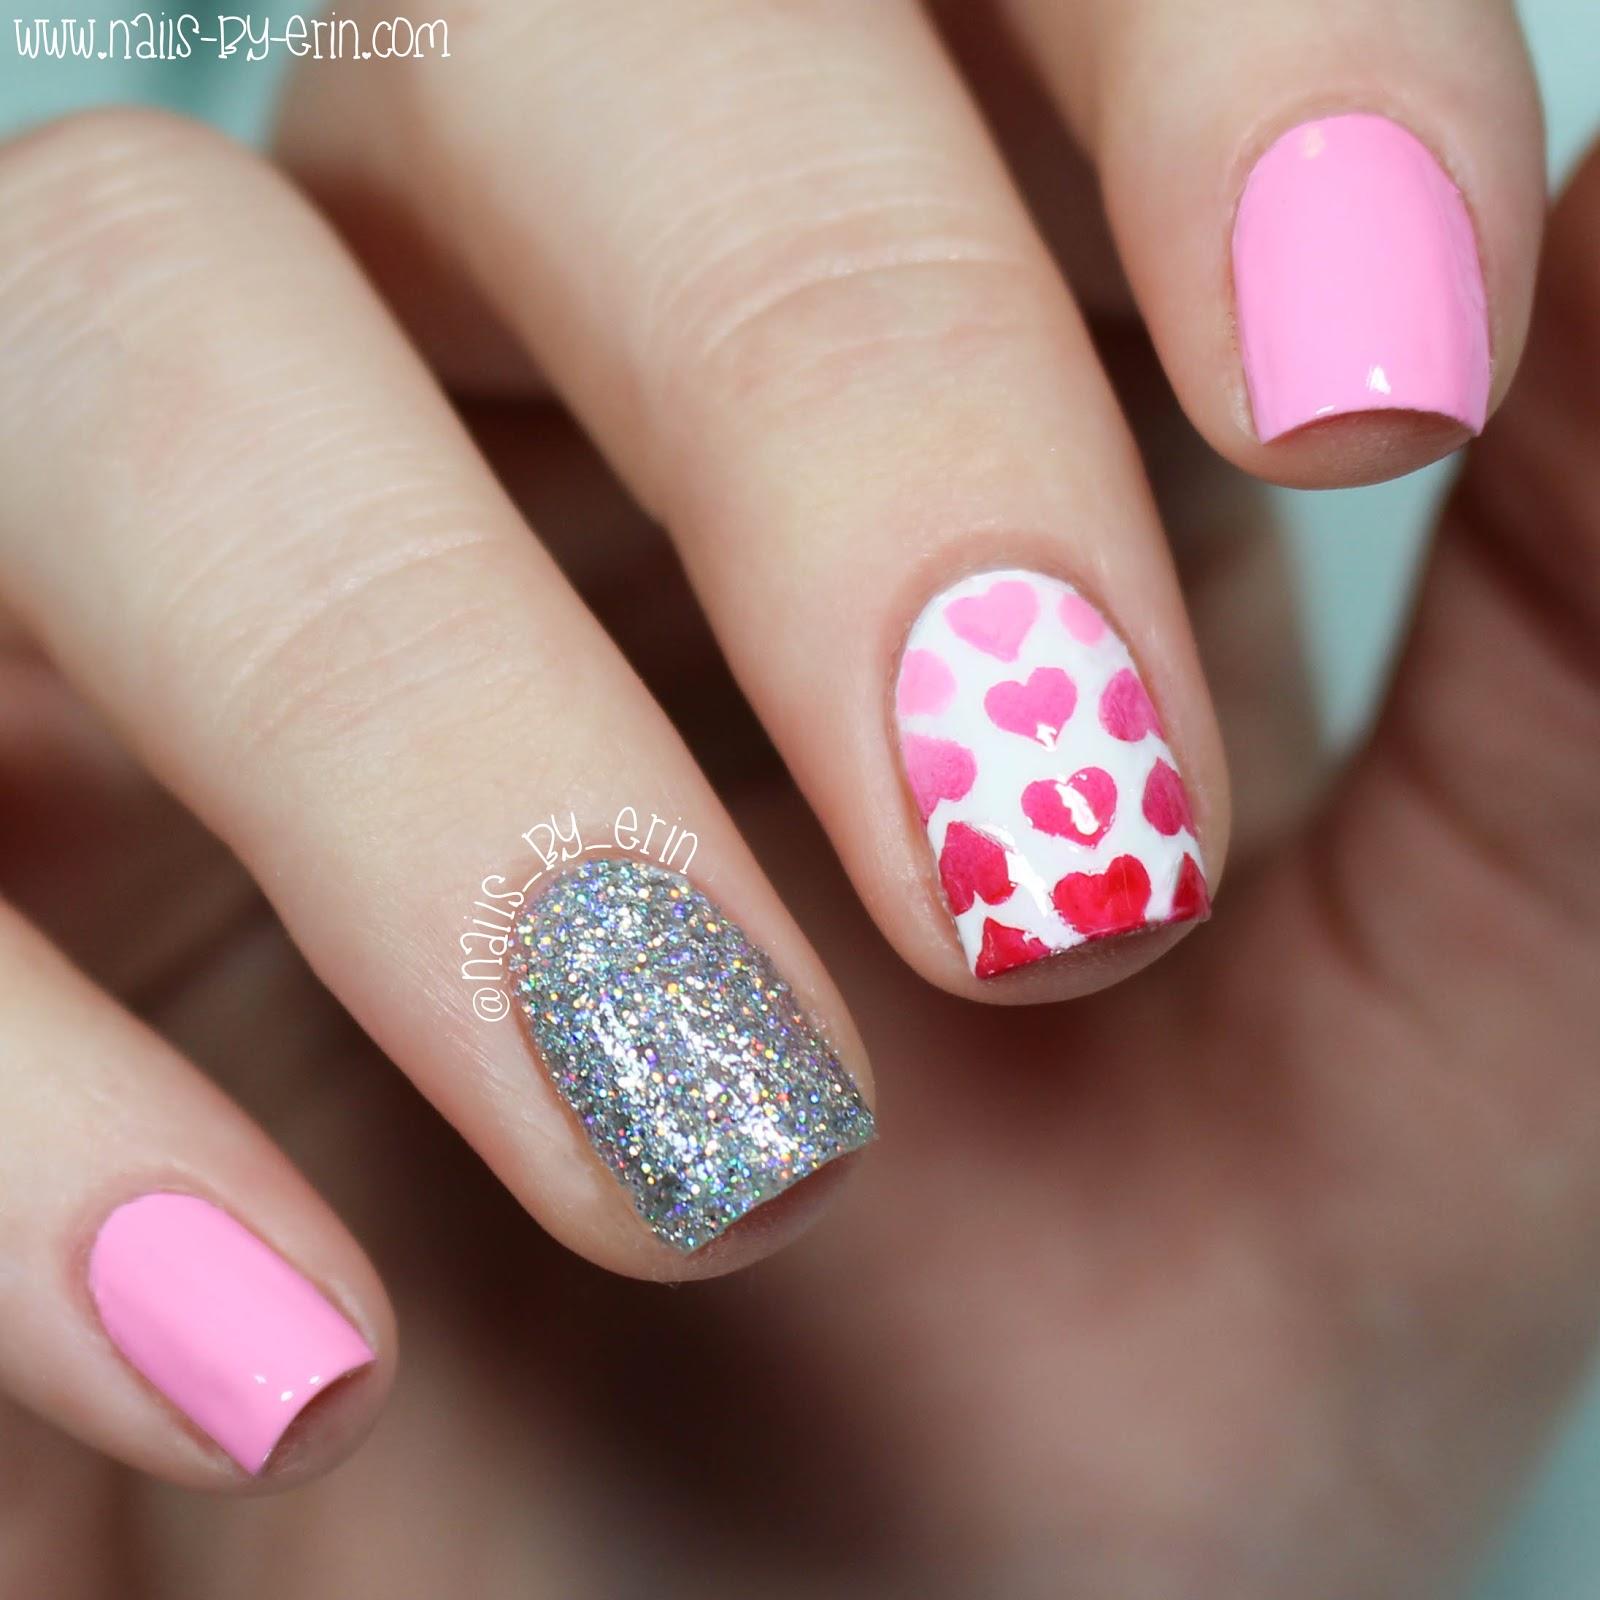 NailsByErin: Gradient Heart Nails